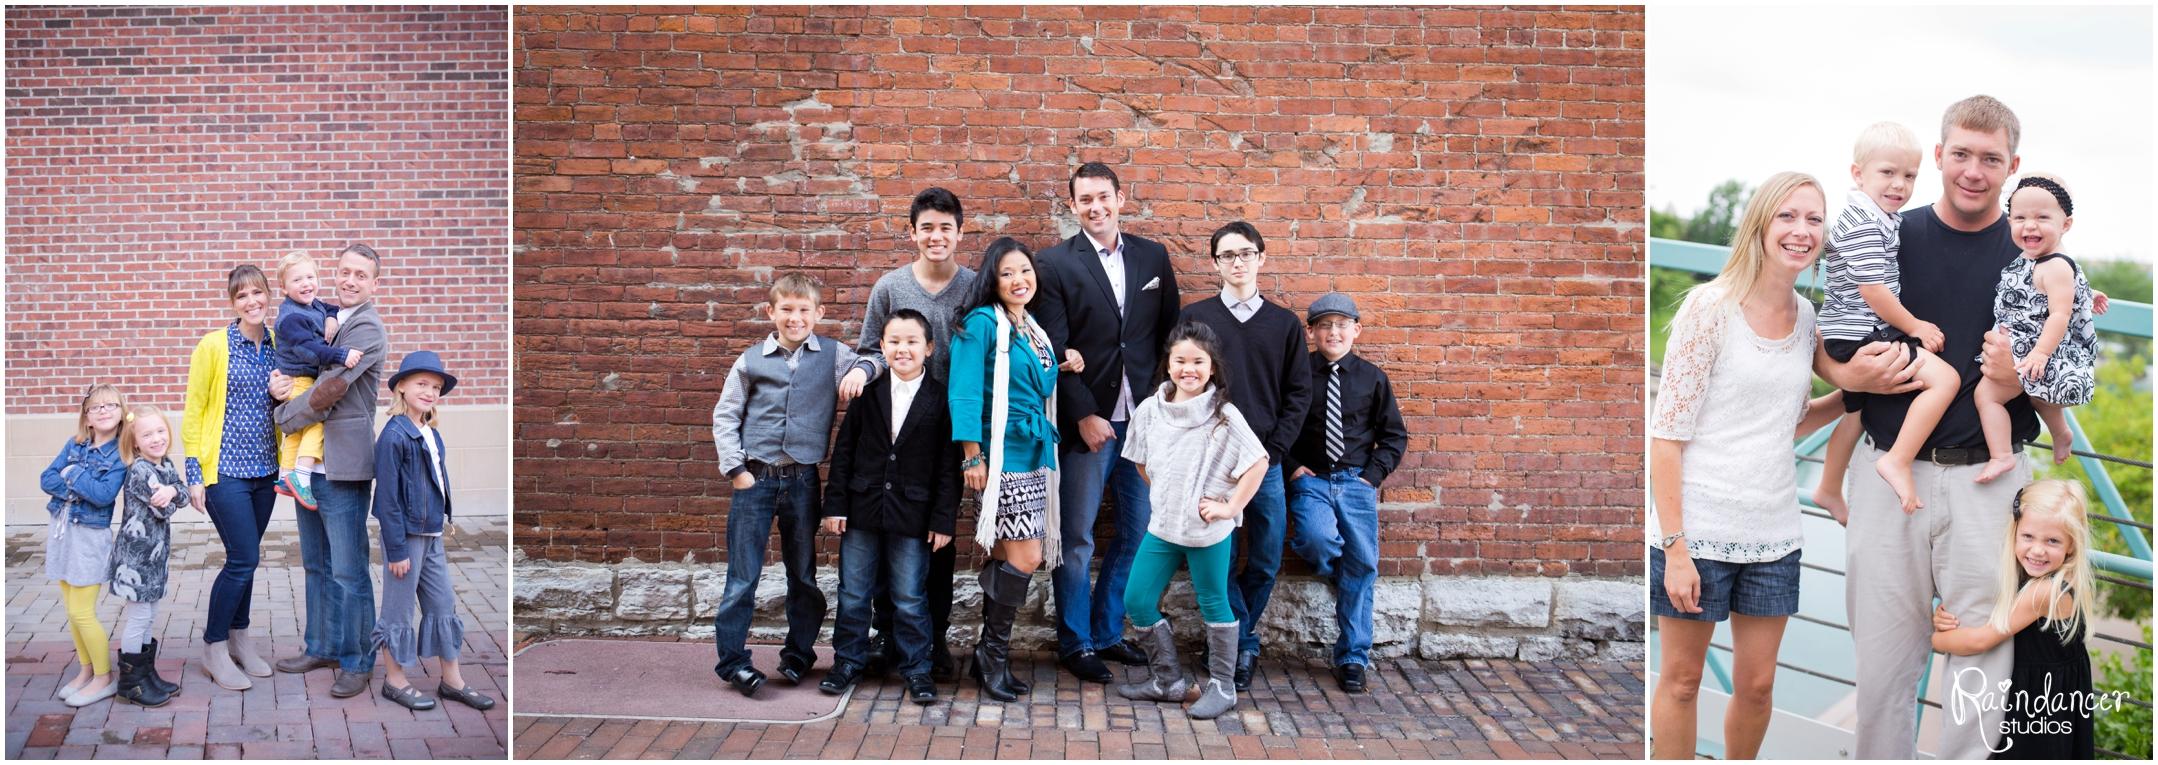 Indianapolis Family Photographer, Indianapolis Children Photographer, Indianapolis Newborn Photographer, Indianapolis Lifestyle photographer